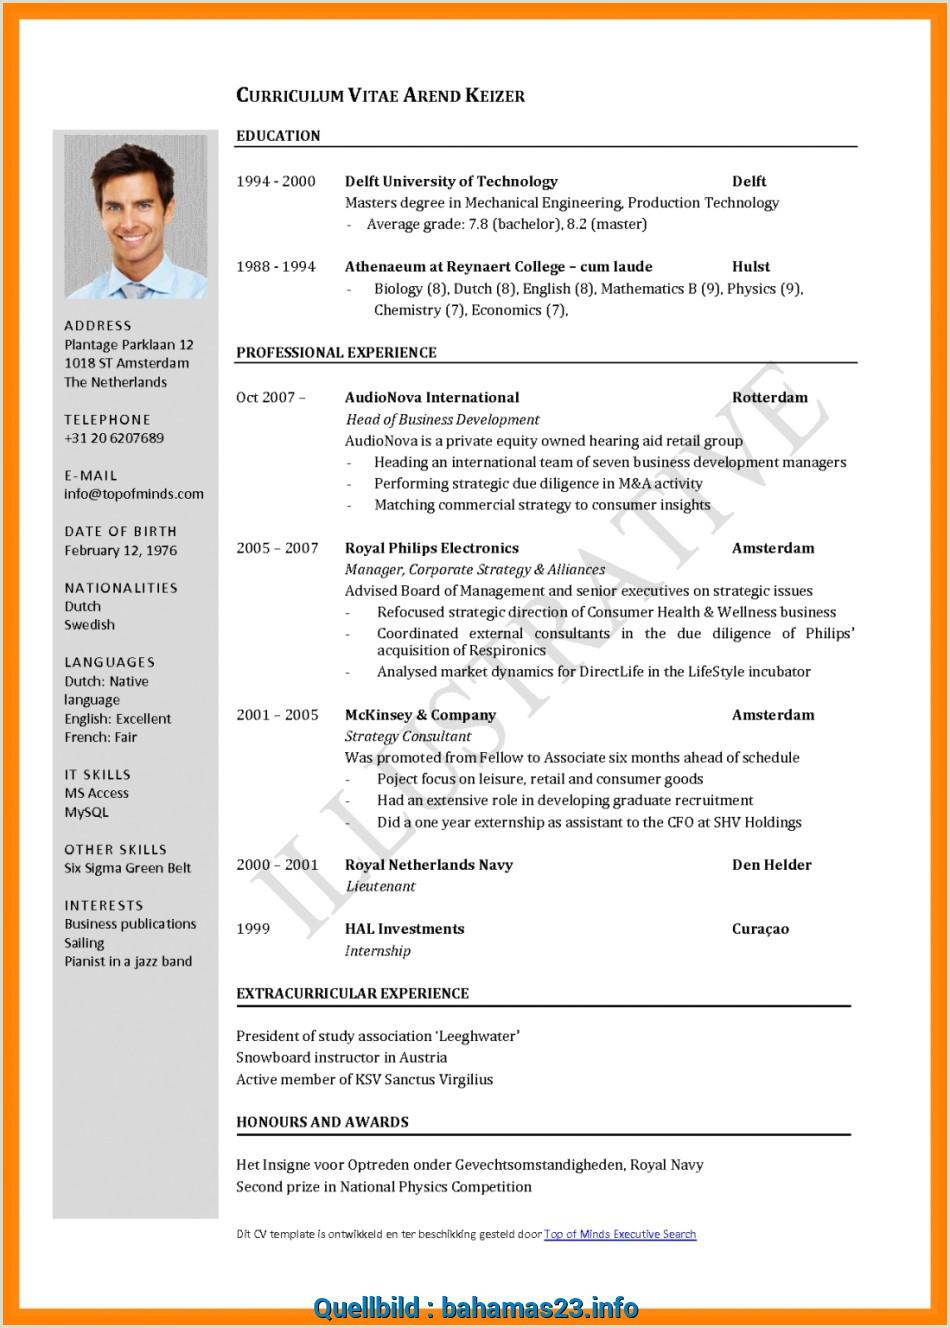 Lebenslauf Akademiker Muster Word Neu Frisch Cv Muster Word Englisch Curriculum Vitae English